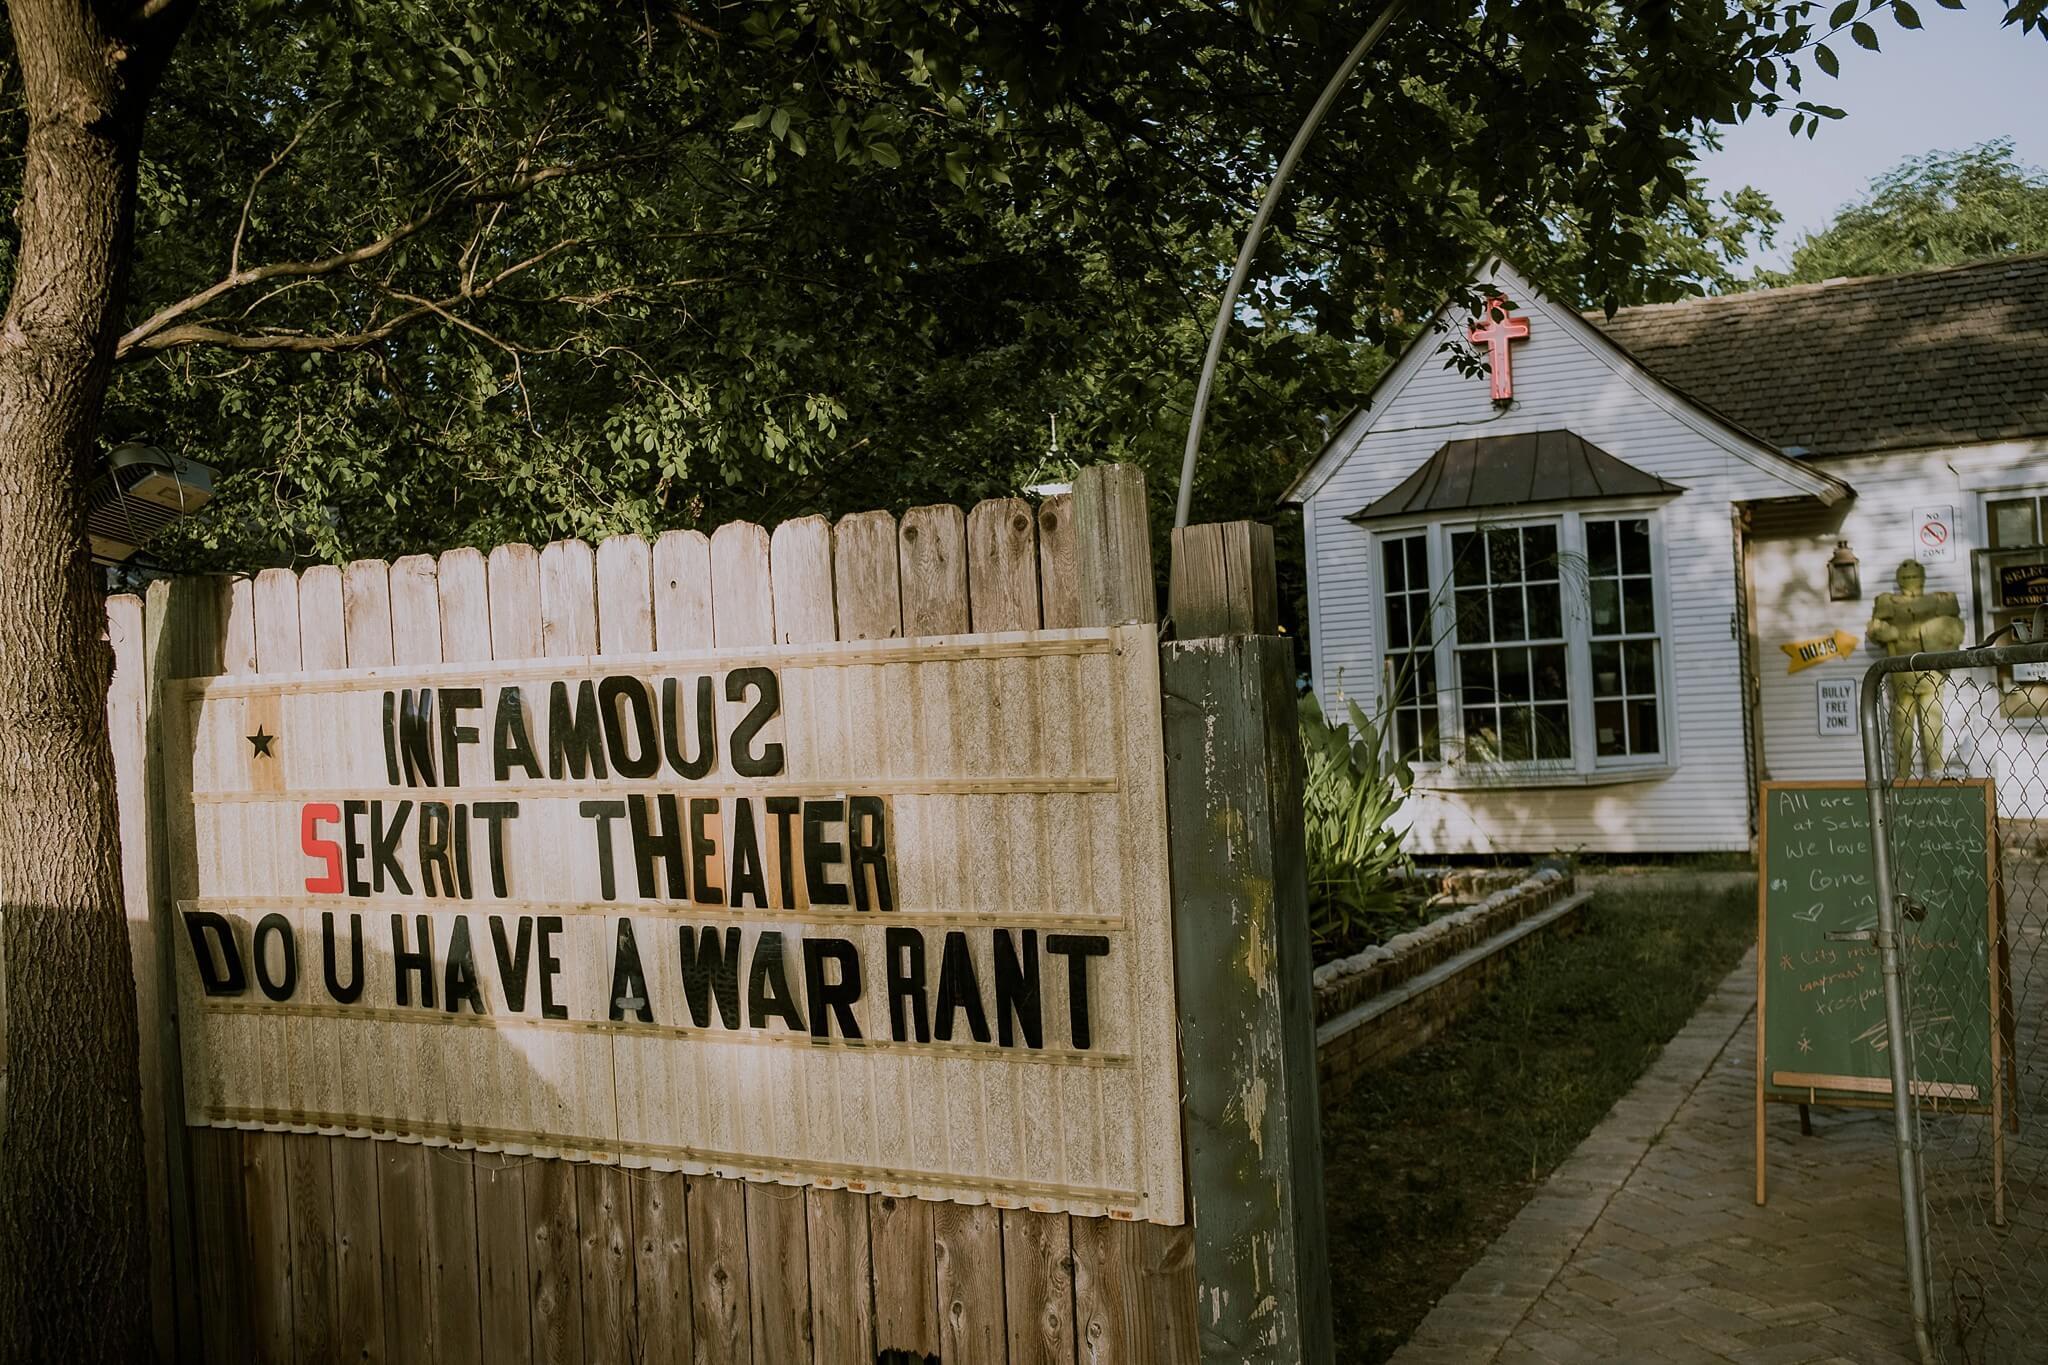 Sekrit Theater Proposal Photographer